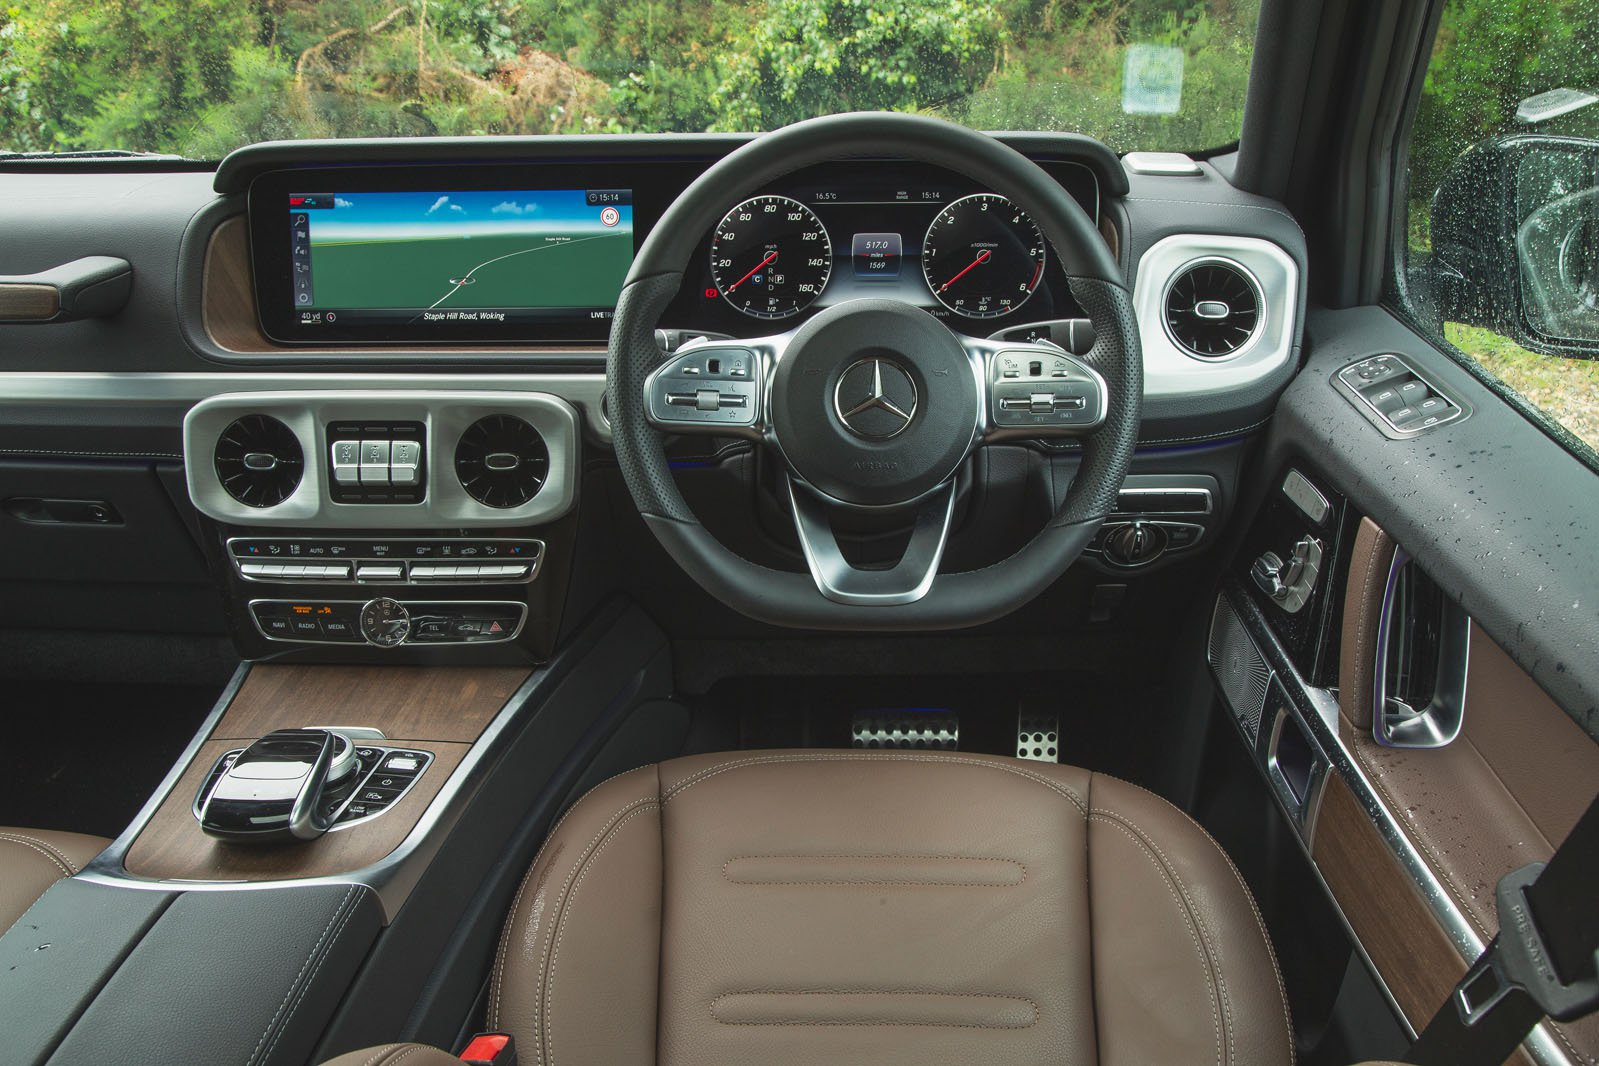 Mercedes-Benz G-Class 2019 RHD dashboard